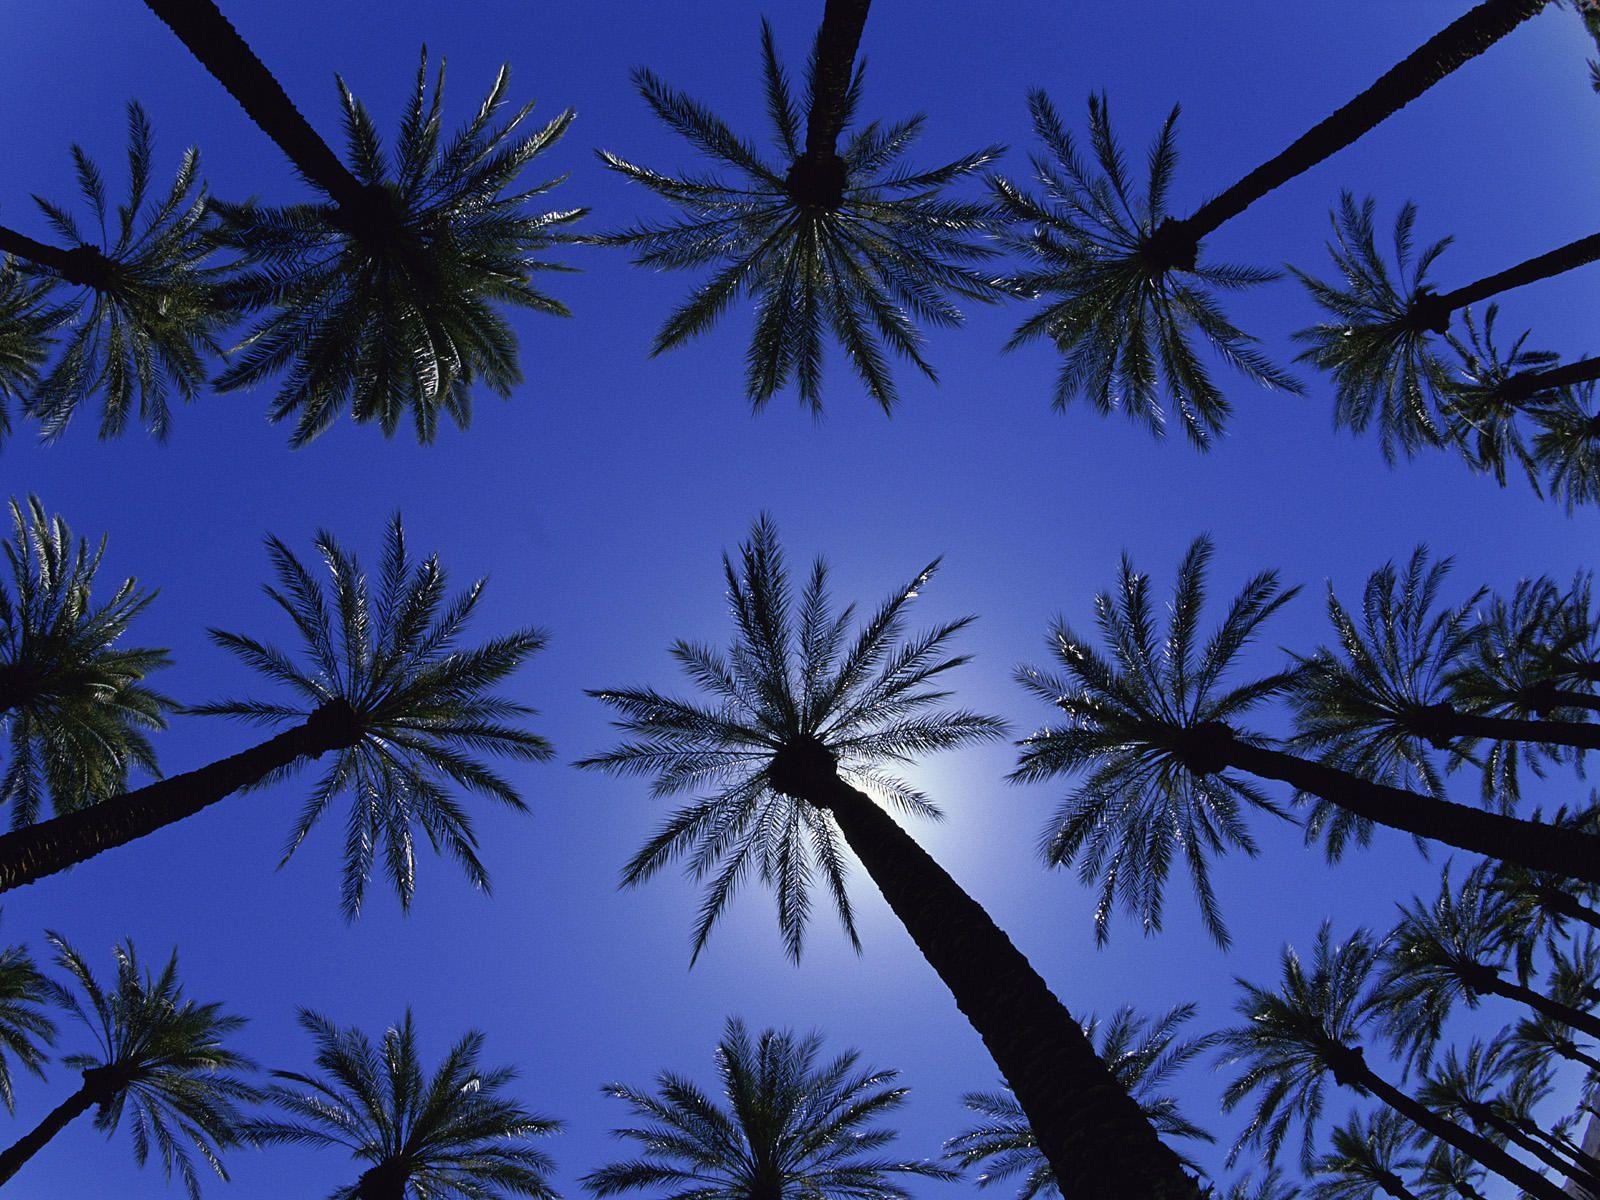 Palm Trees Reference Пальмовые деревья, Пальмы